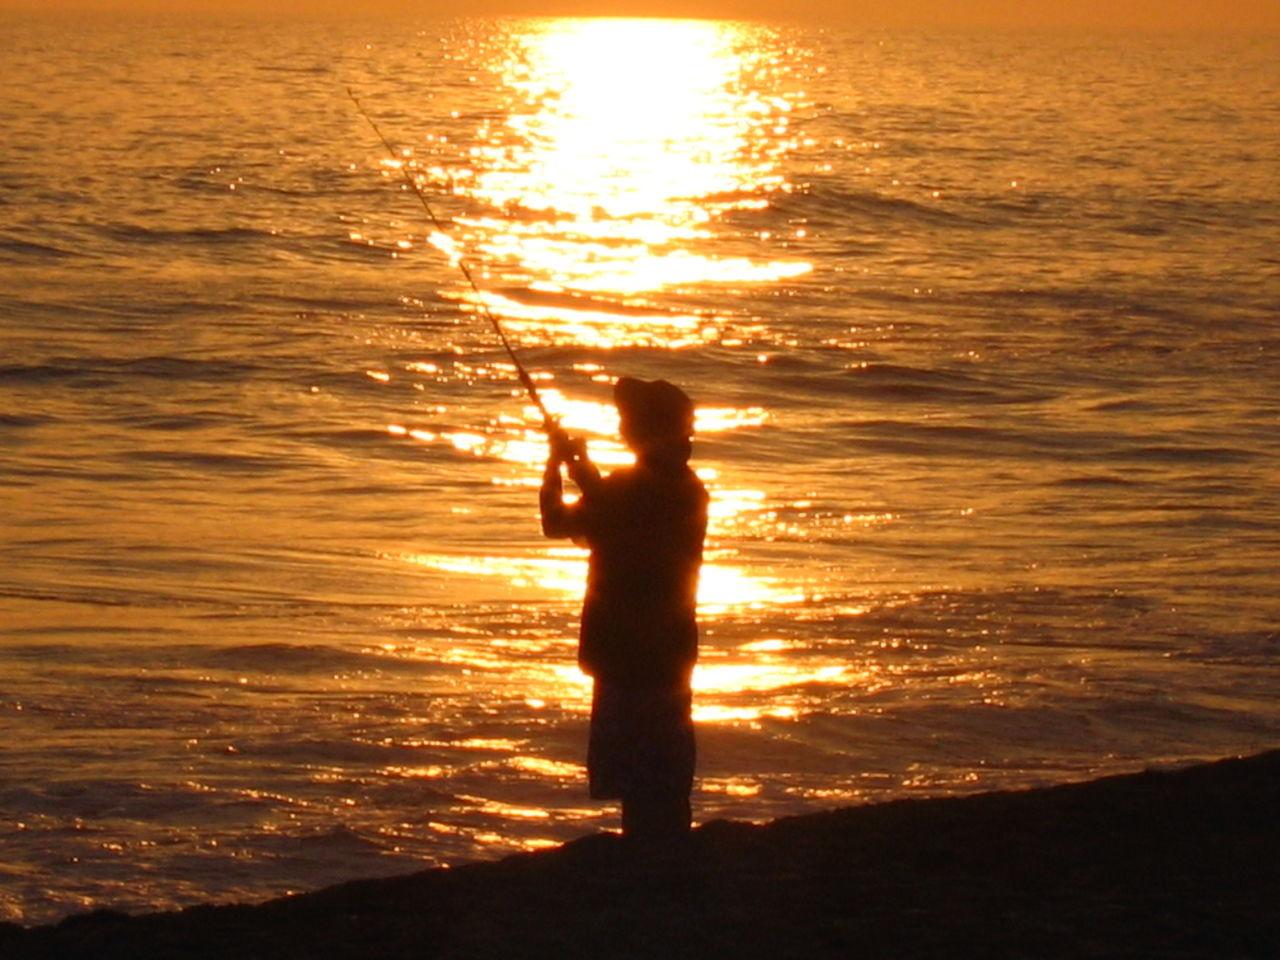 Beautiful stock photos of engel, Beauty In Nature, California, Fishing, Fishing Rod